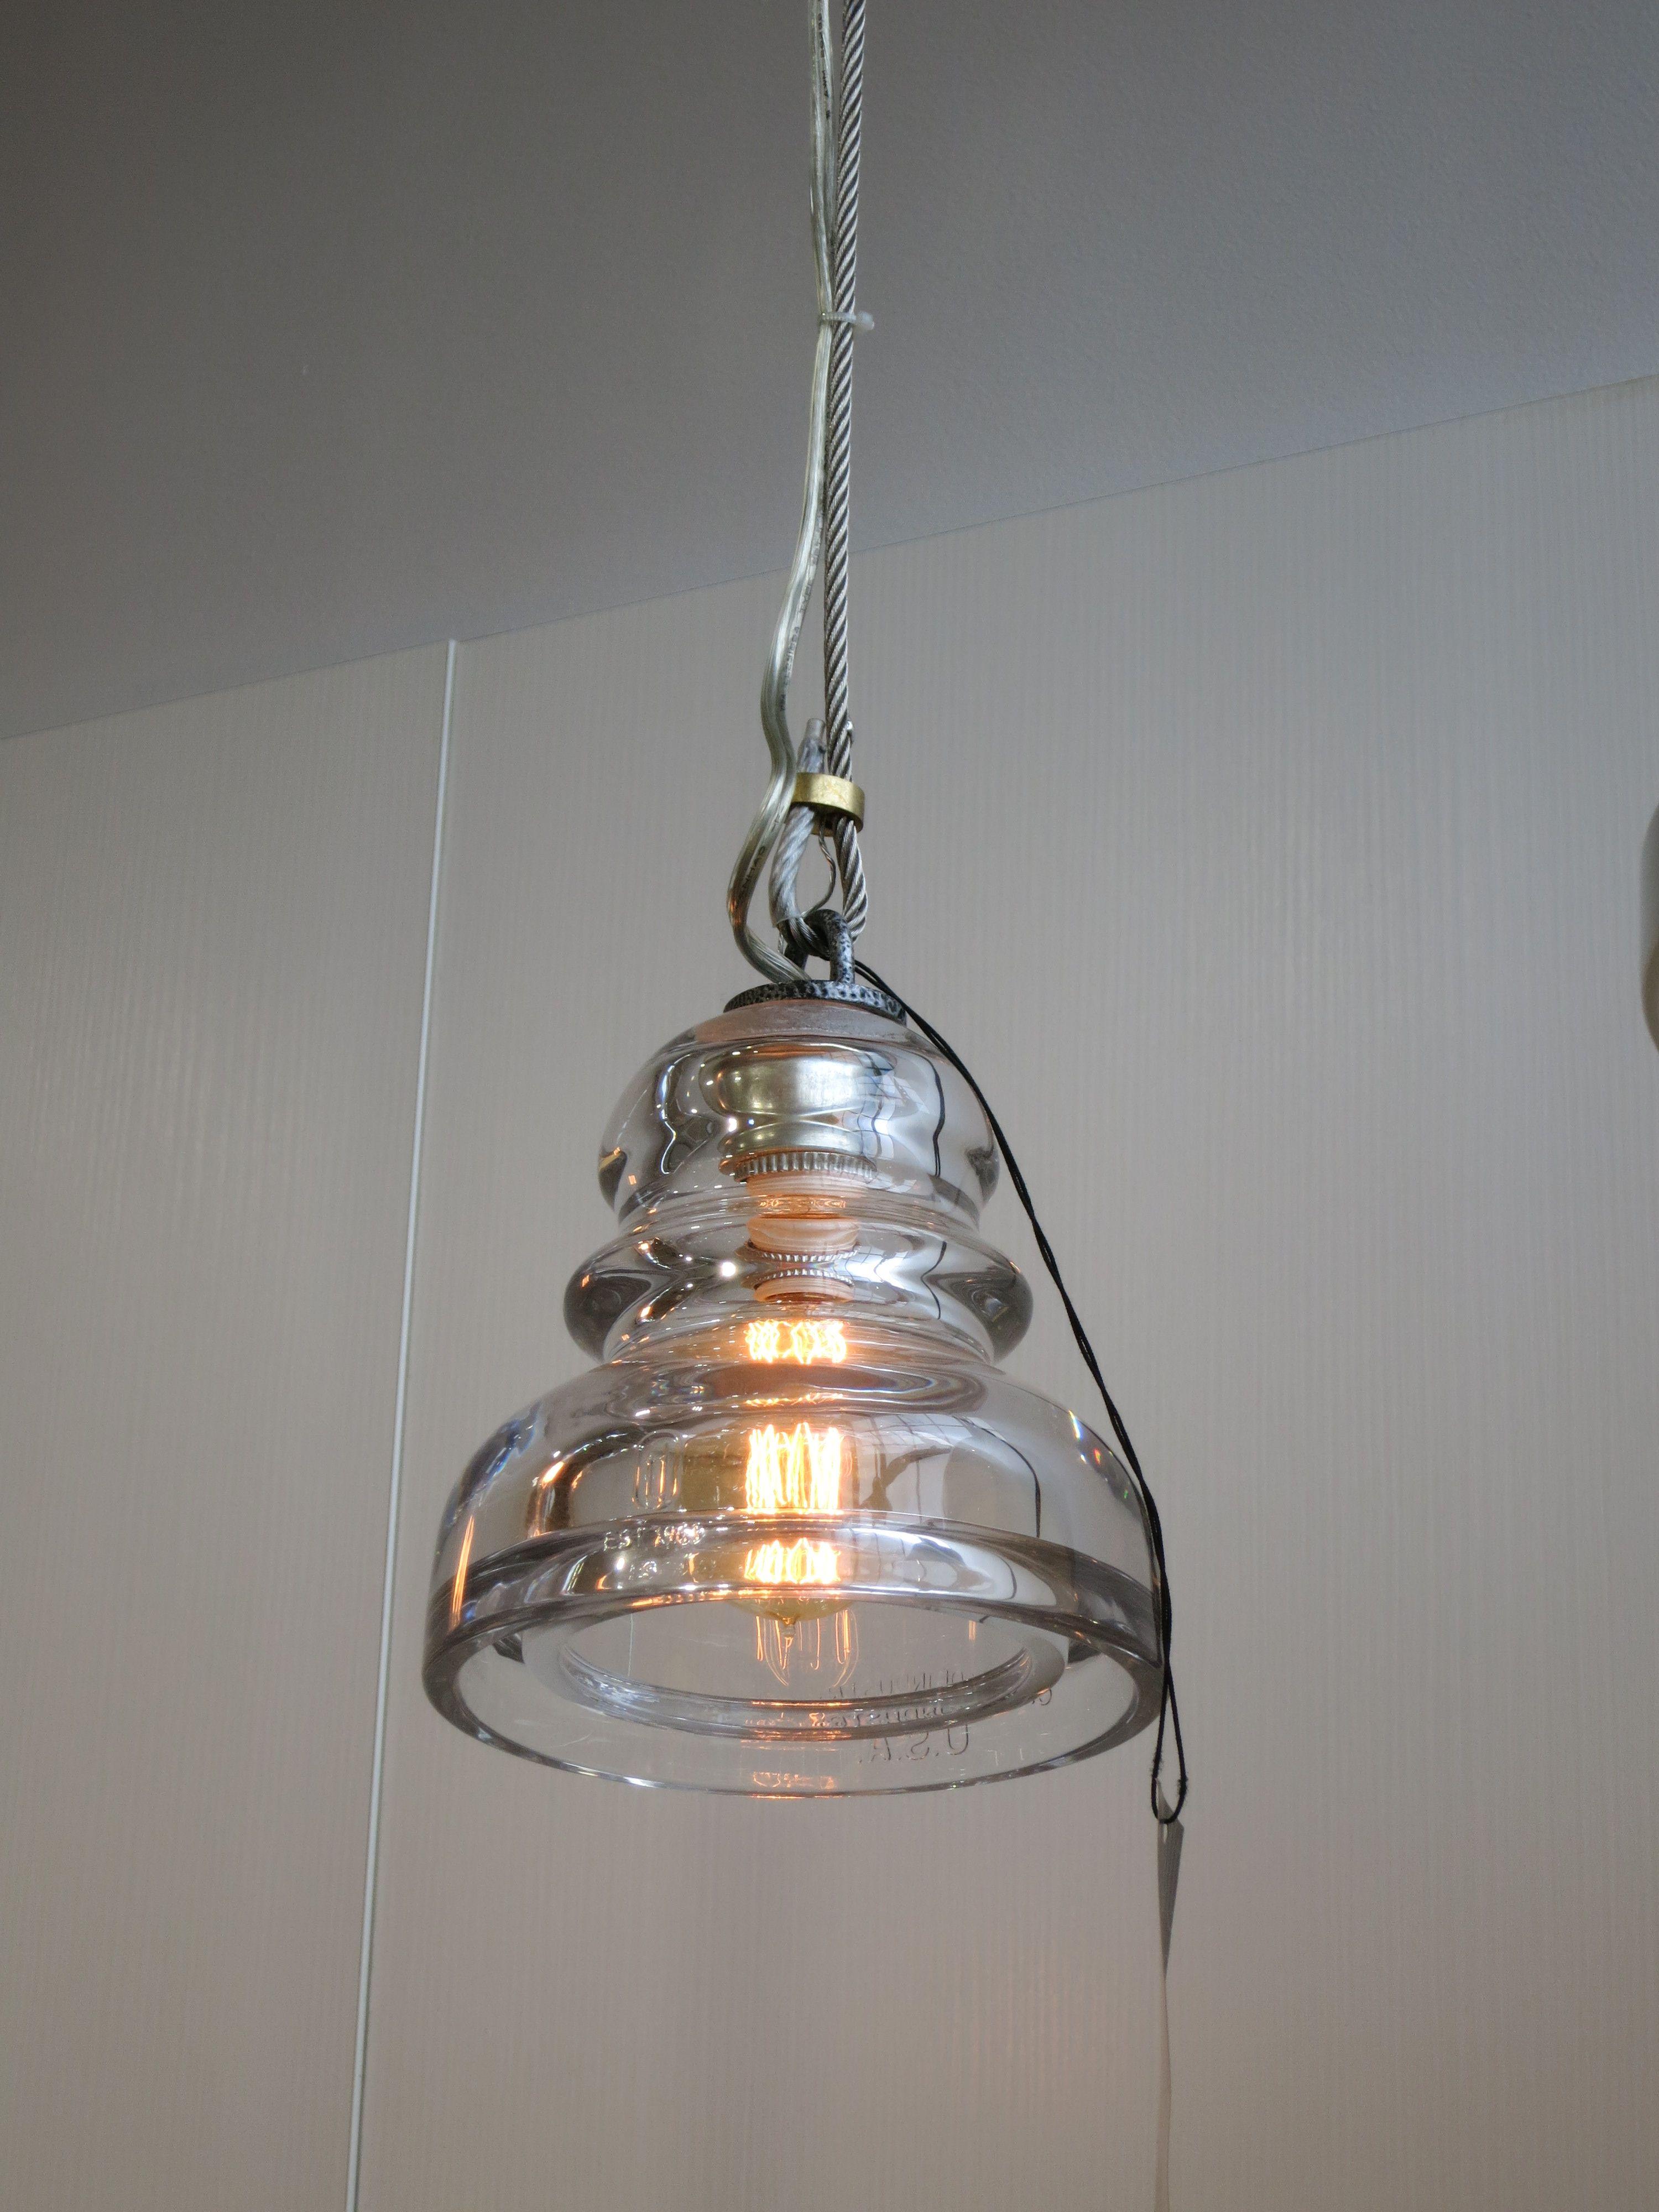 Showroom Photo Of The Troy Lighting Menlo Park Pendant 5 75 W 10 H